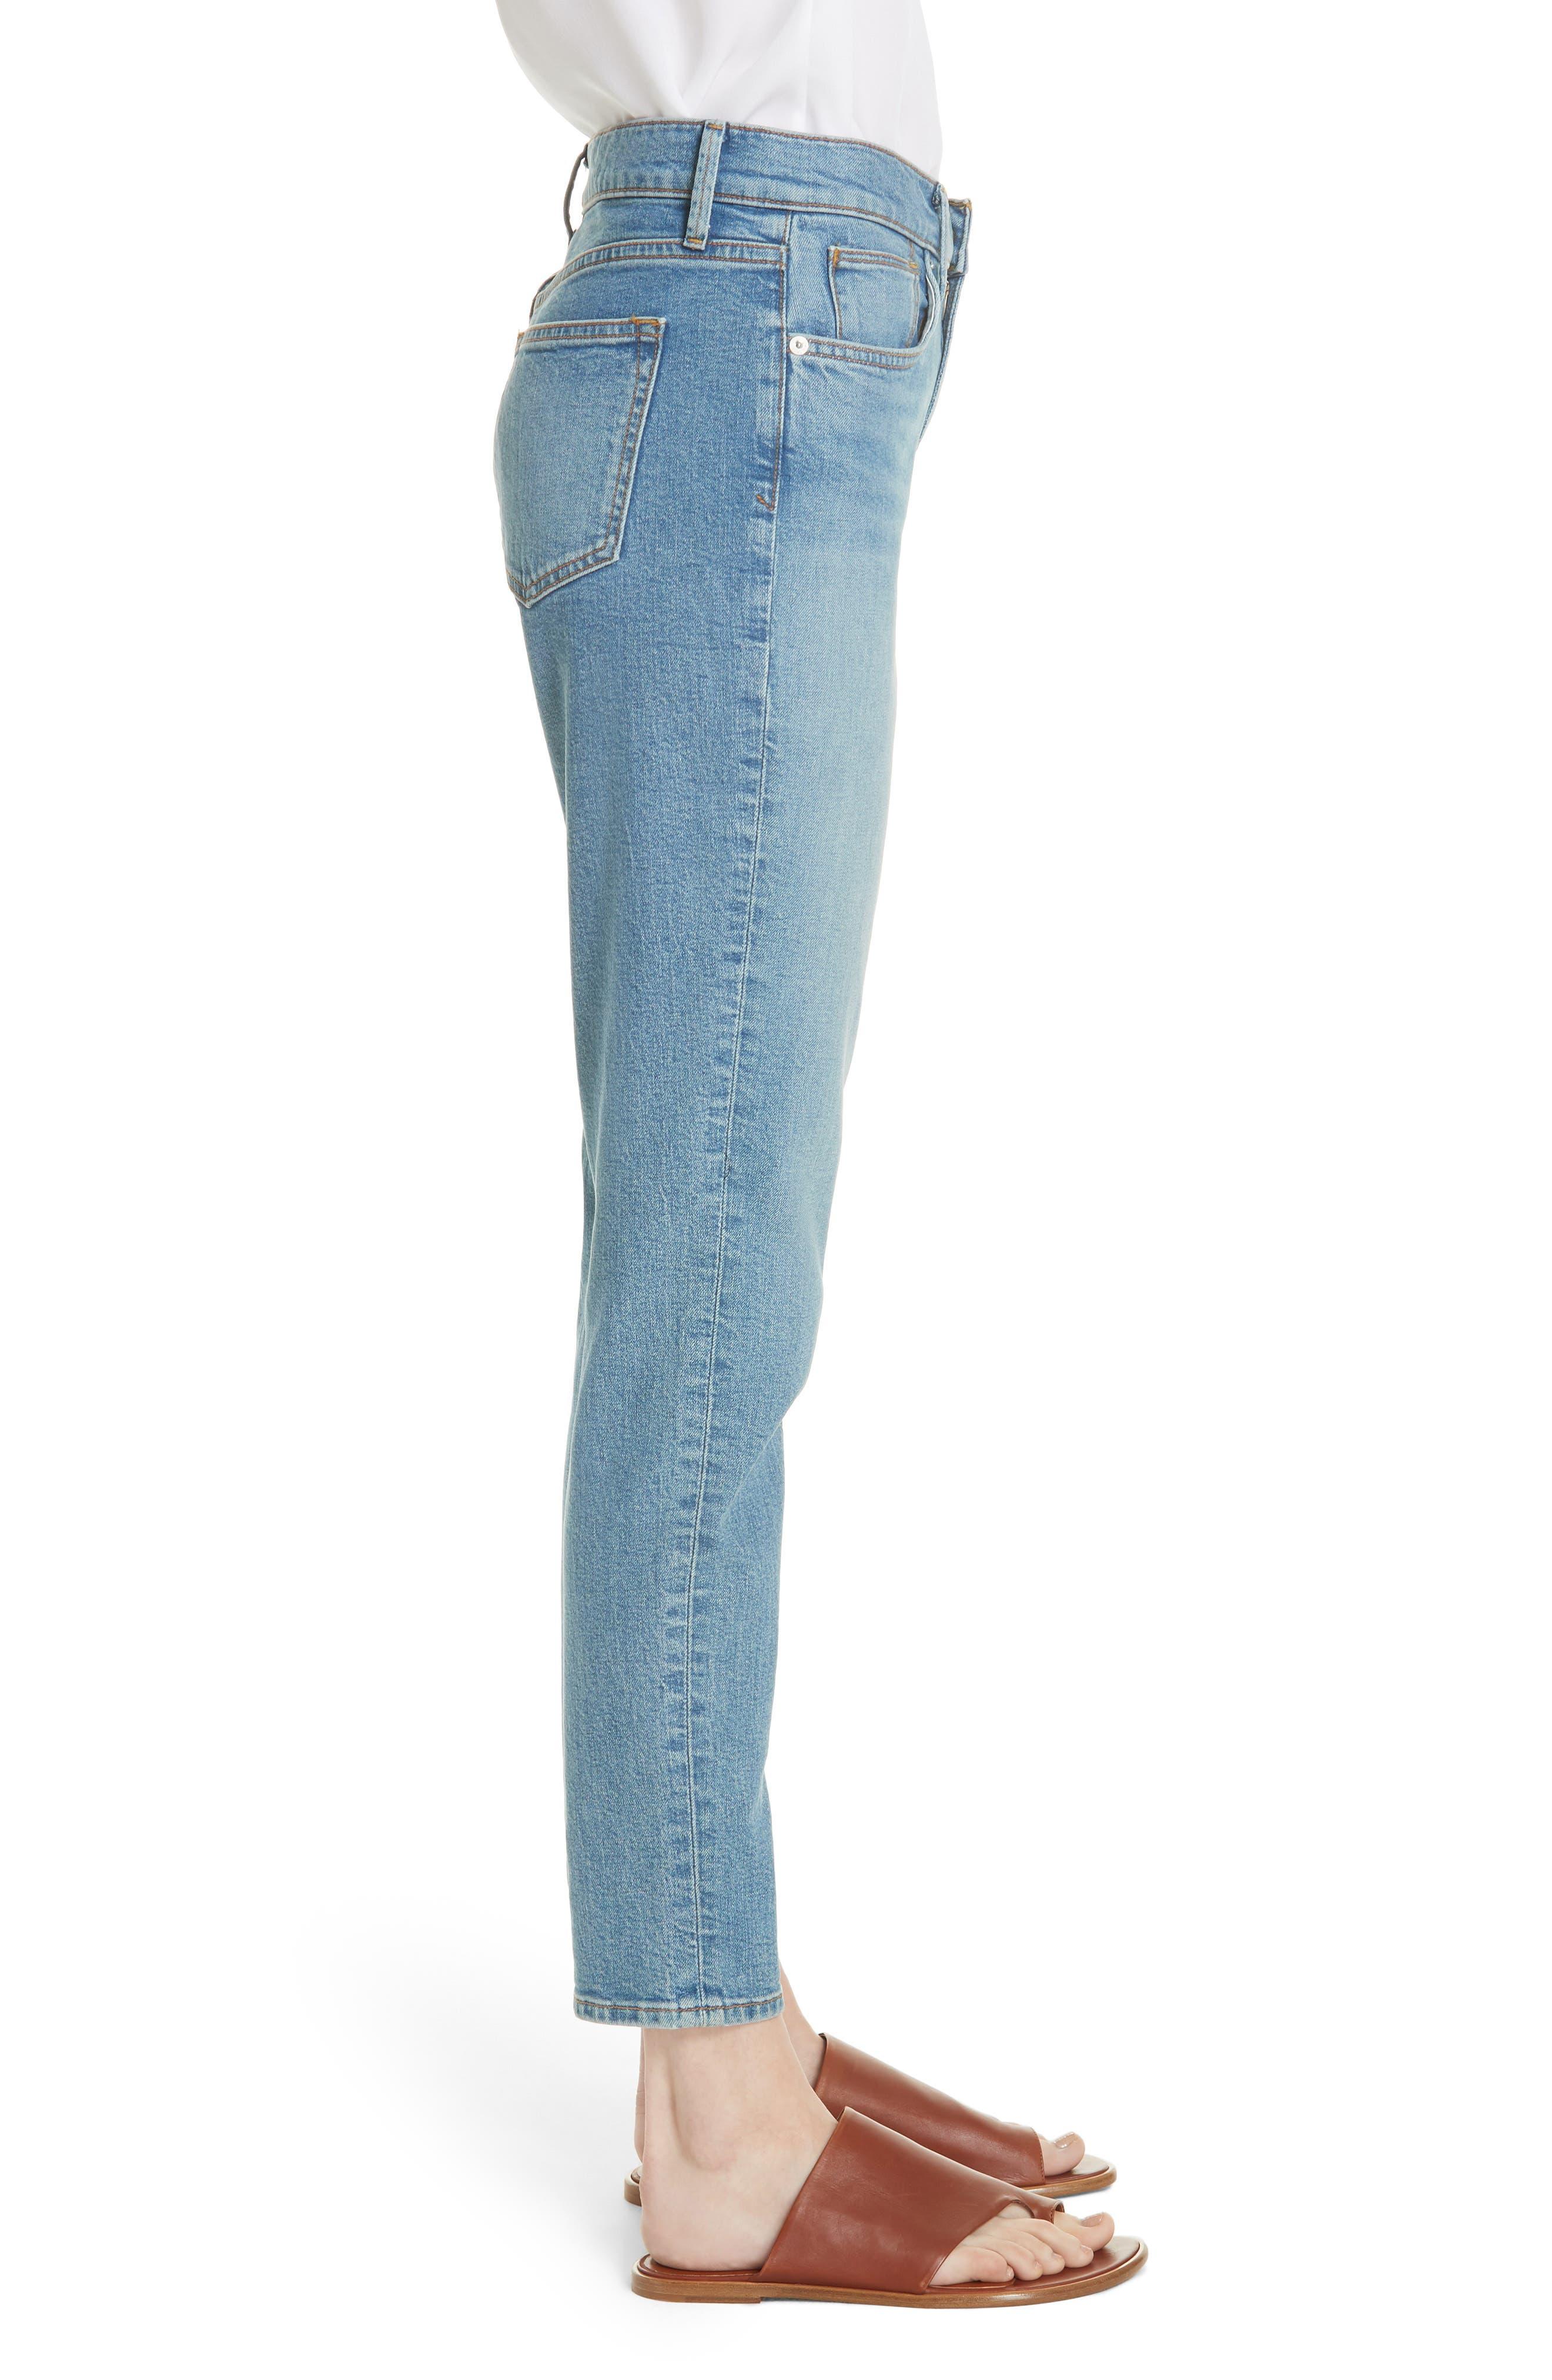 5-Pocket Skinny Jeans,                             Alternate thumbnail 3, color,                             LIGHT WASH